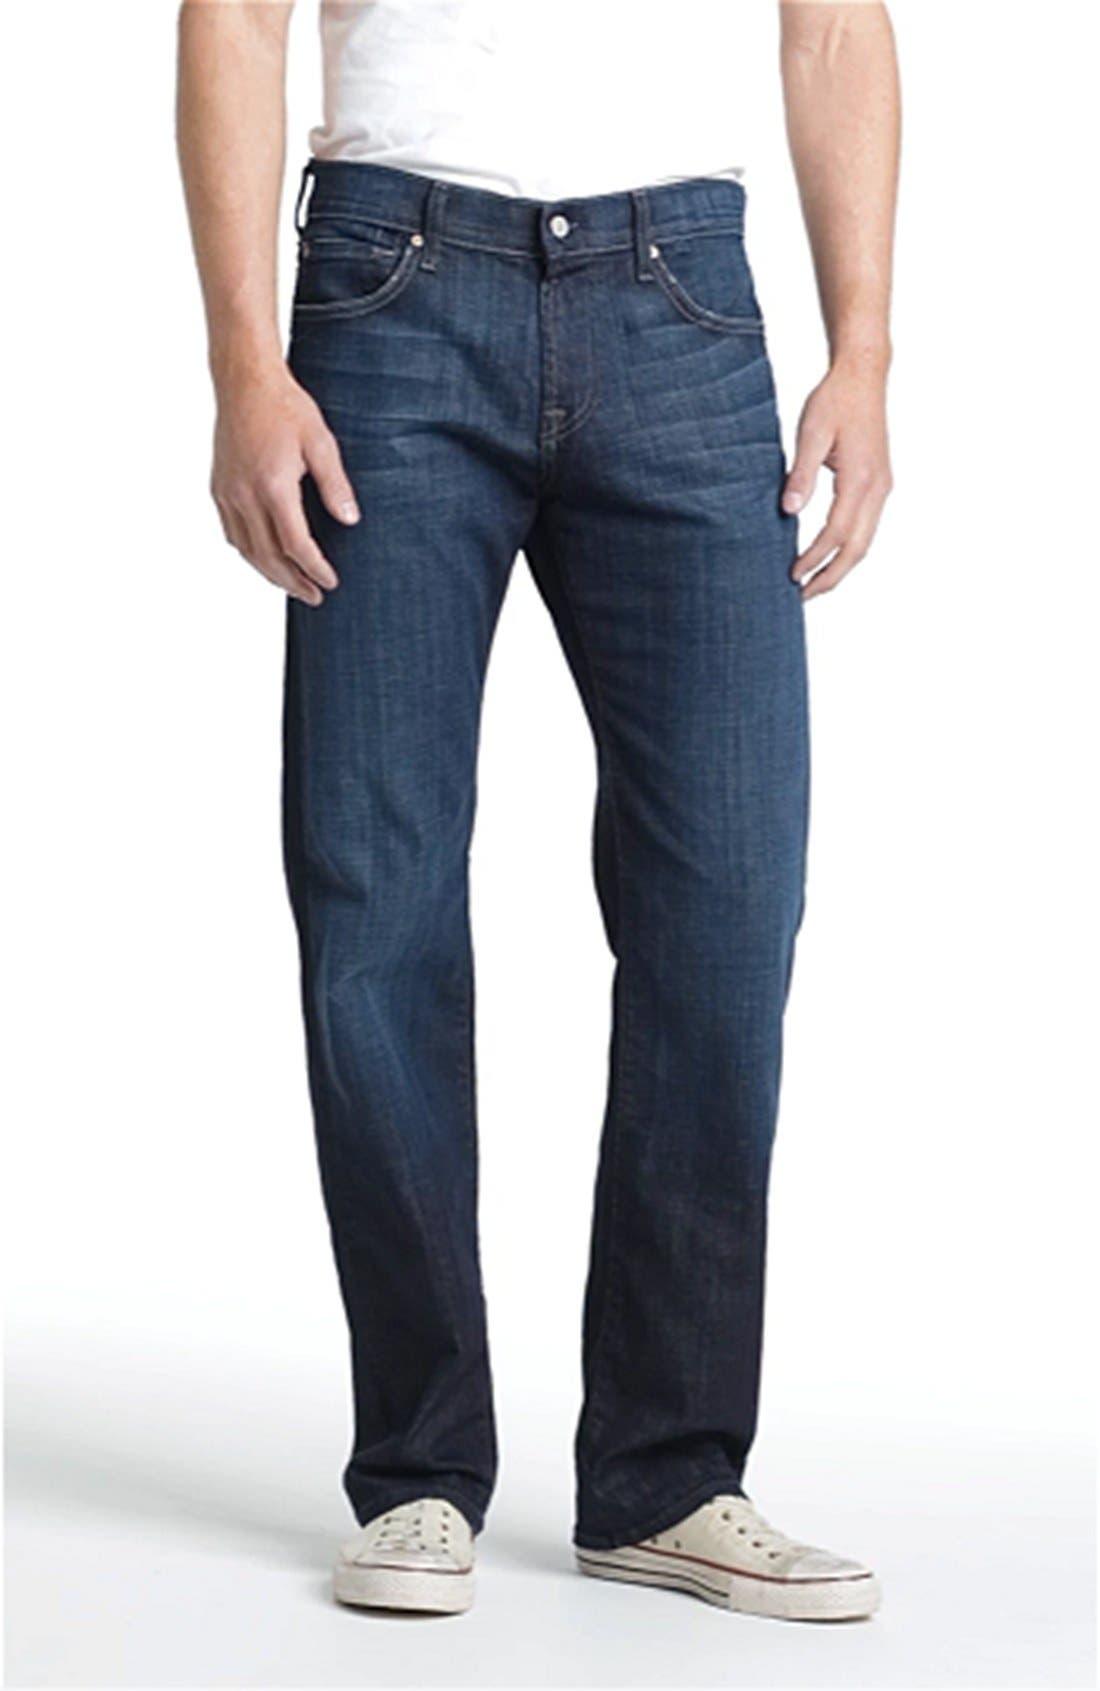 Austyn Relaxed Straight Leg Jeans,                             Alternate thumbnail 3, color,                             LOS ANGELES DARK